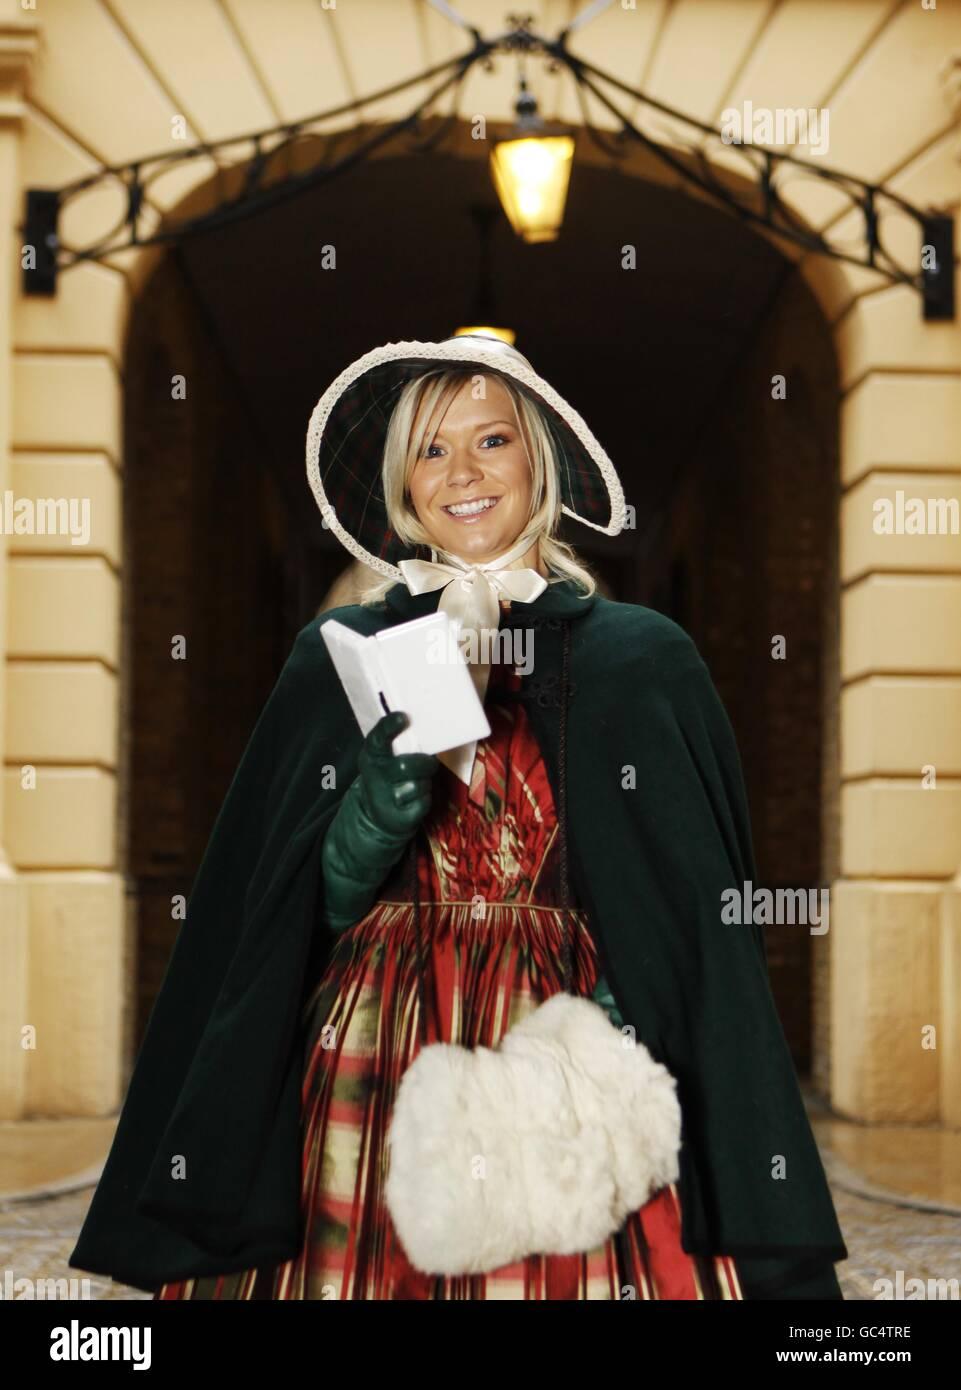 Dressed As A Dickensian Carol Singer Stockfotos & Dressed As A ...